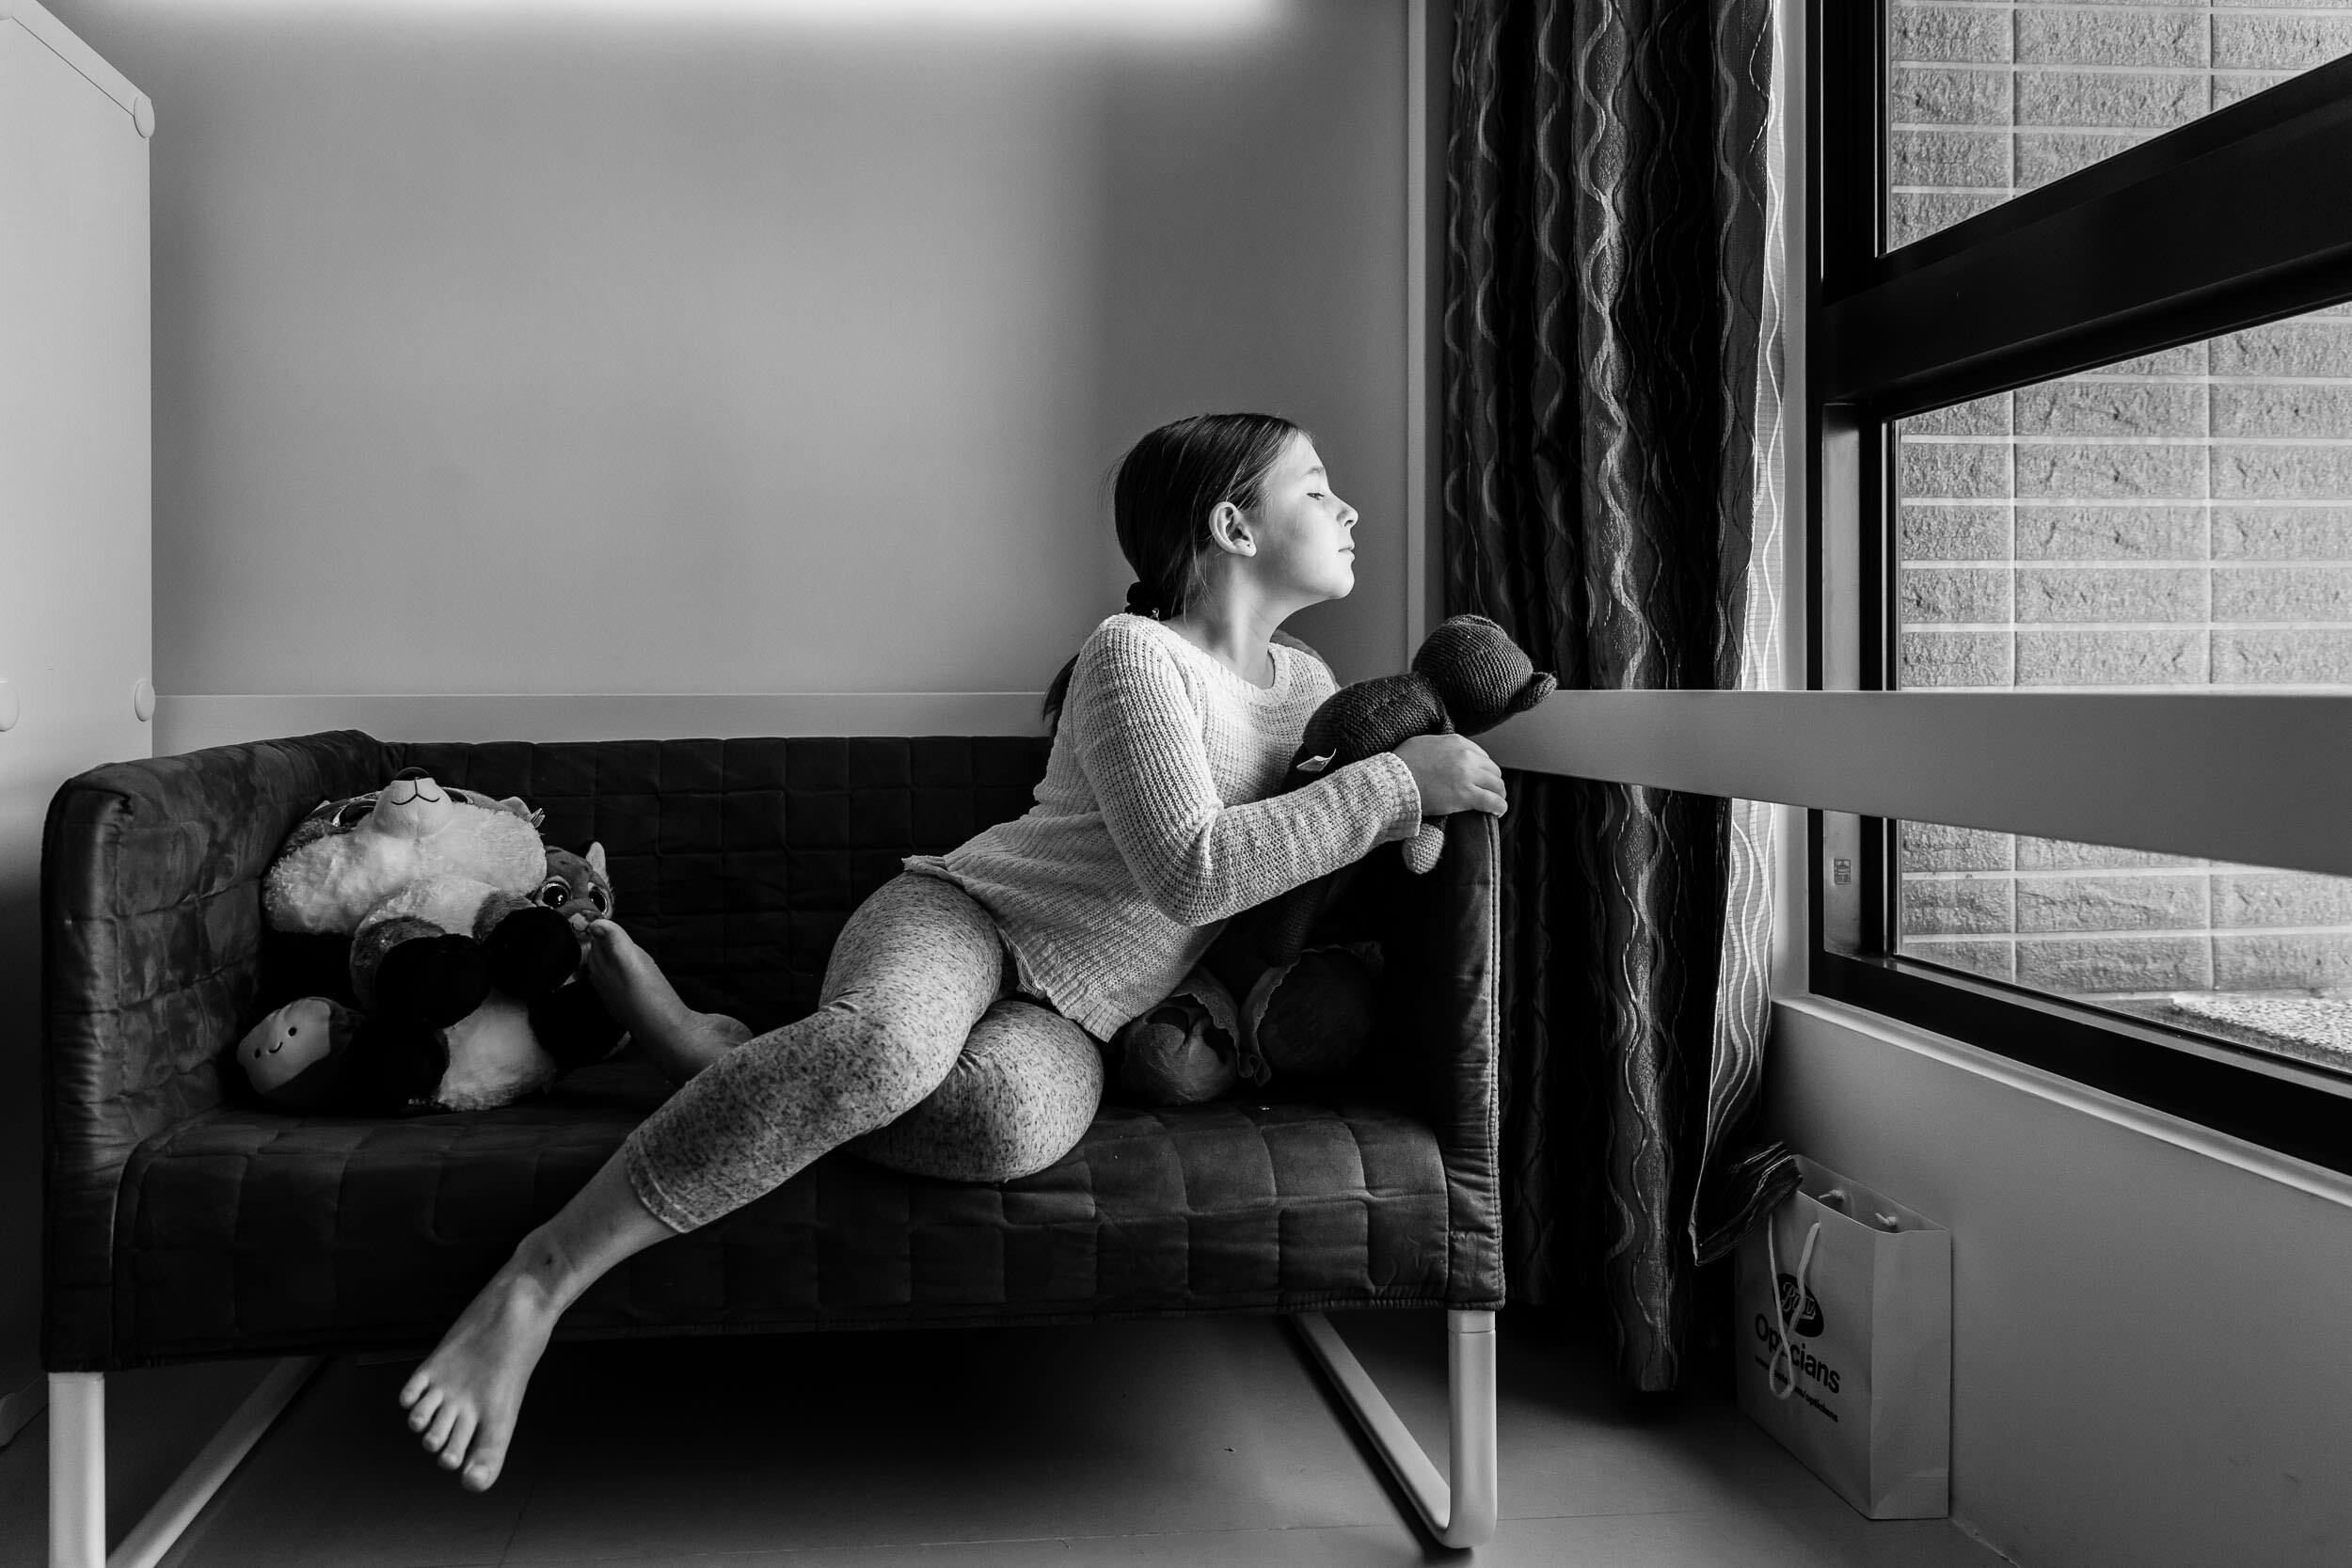 In-Home-photography-portland-oregon-rebecca-hunnicutt-farren-16.jpg